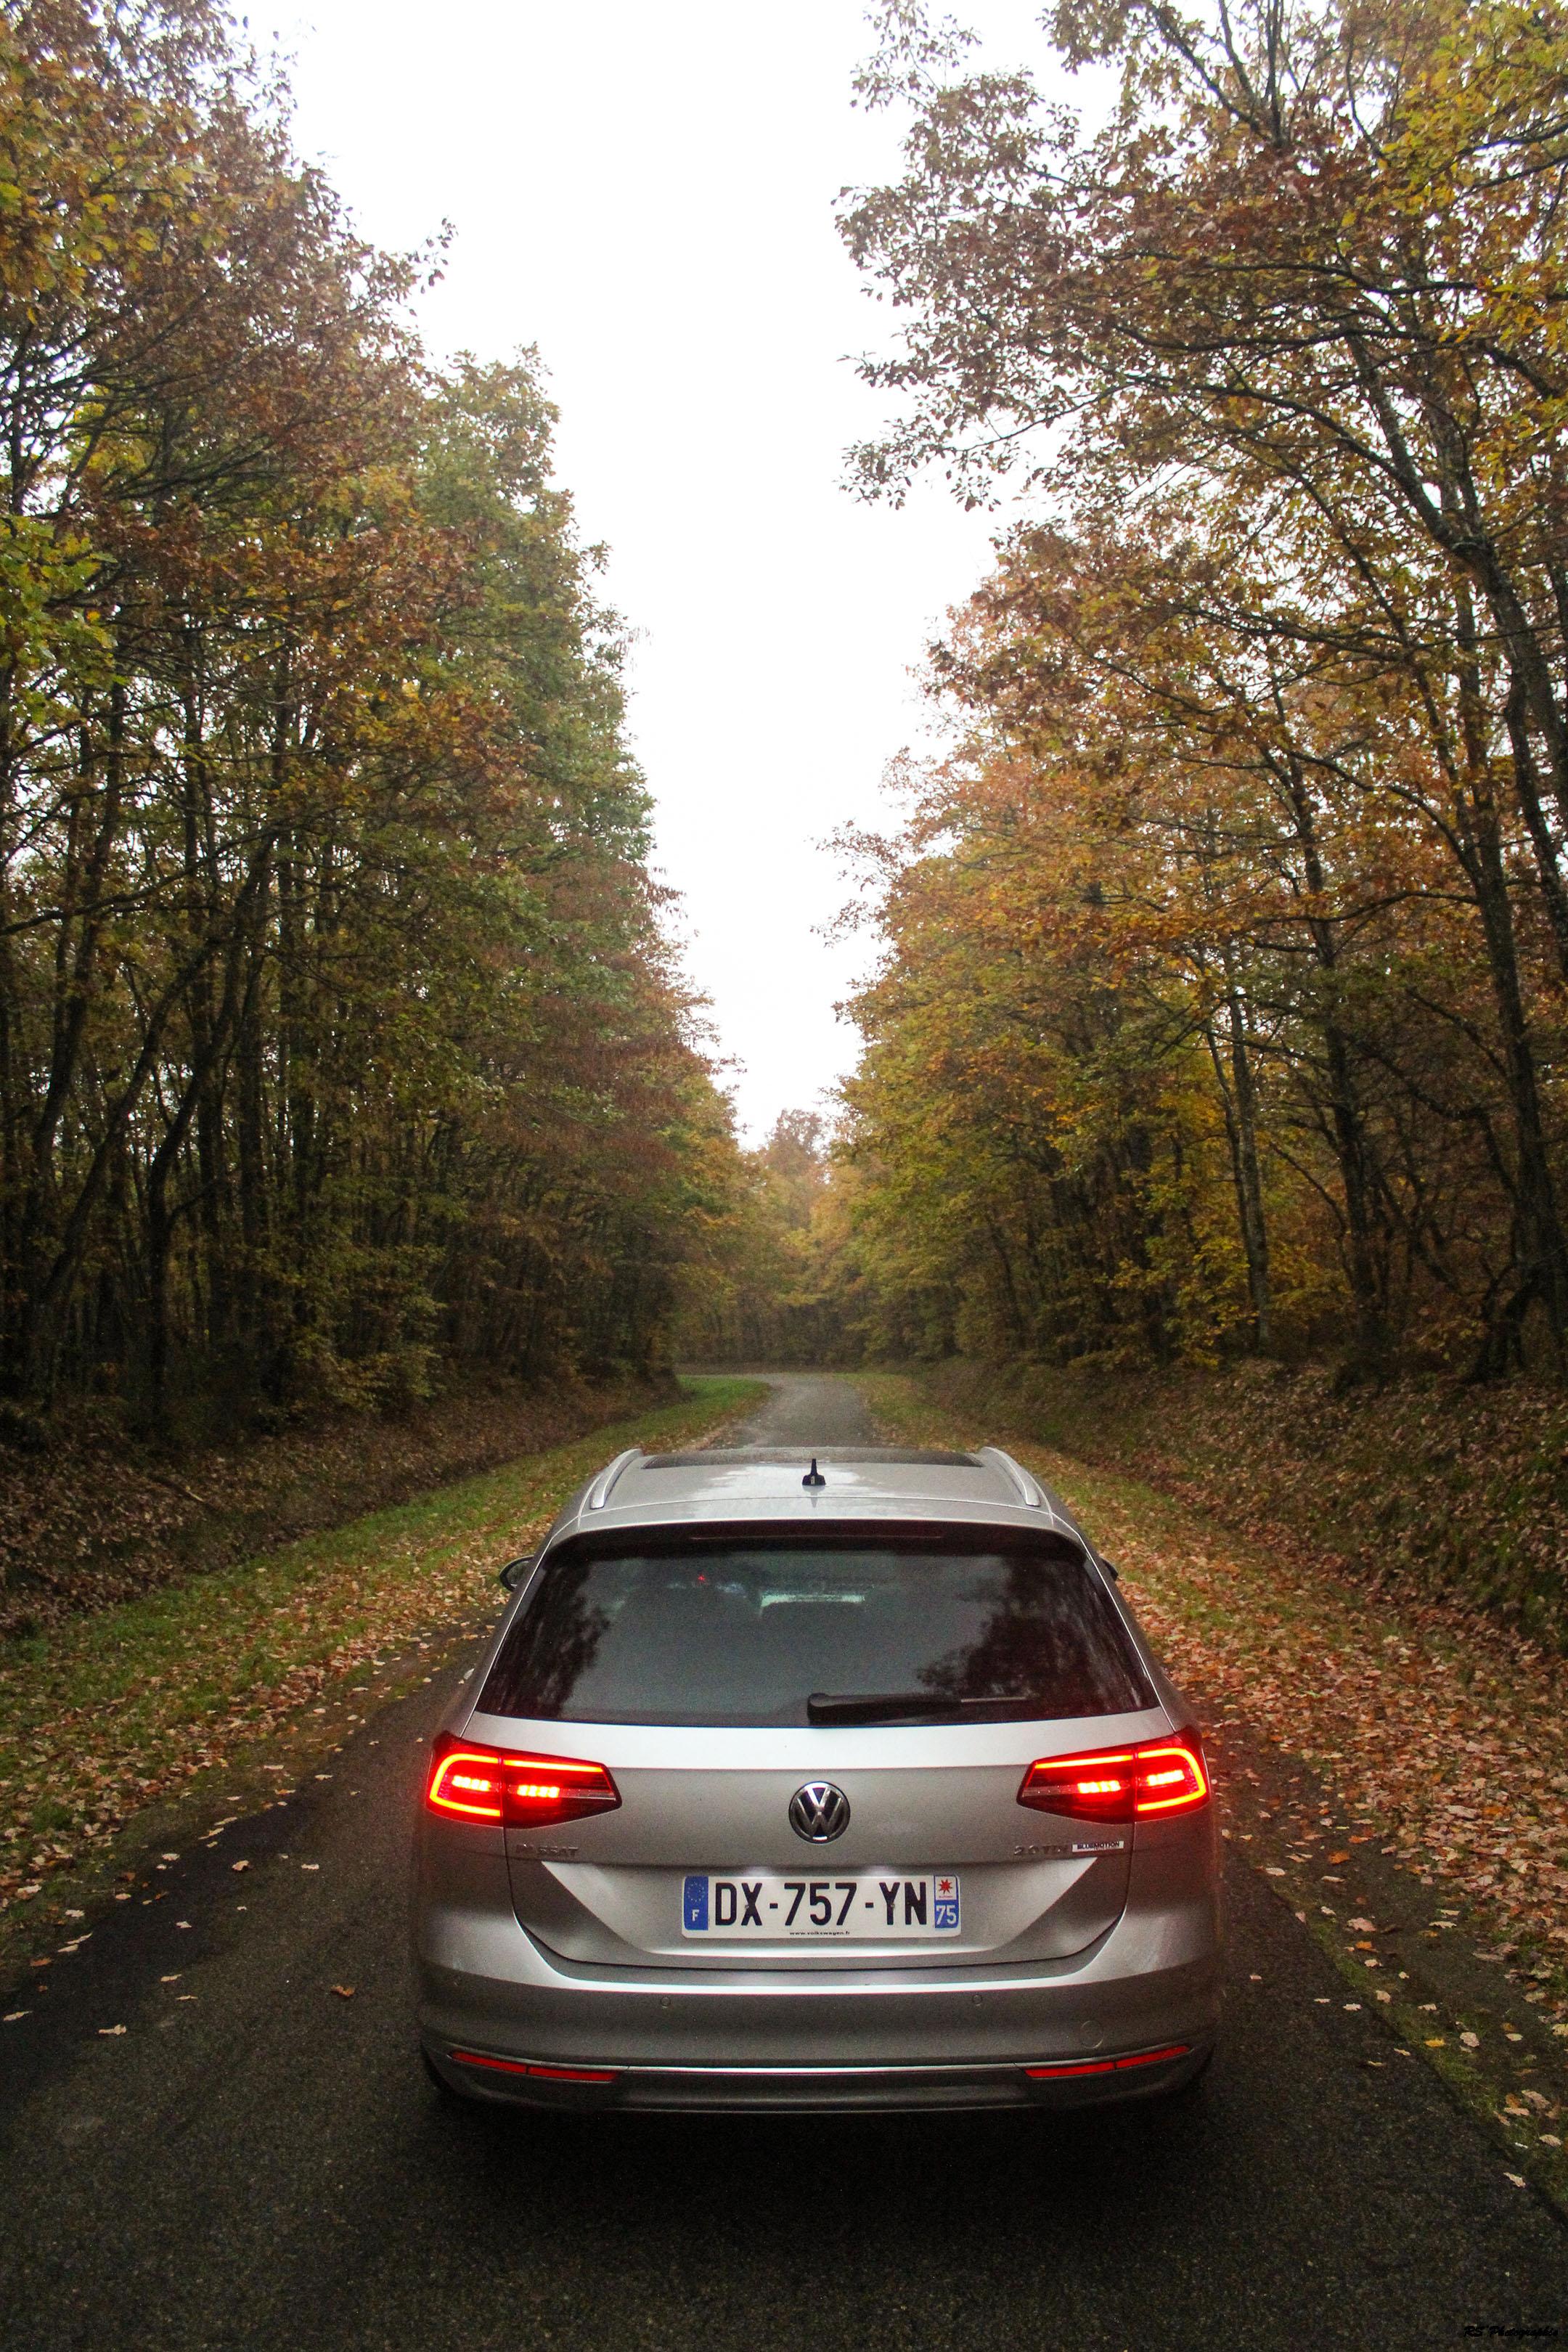 vwpassatsw41-volkswagen-passat-sw-arriere-rear-arnaud-demasier-rsphotographie